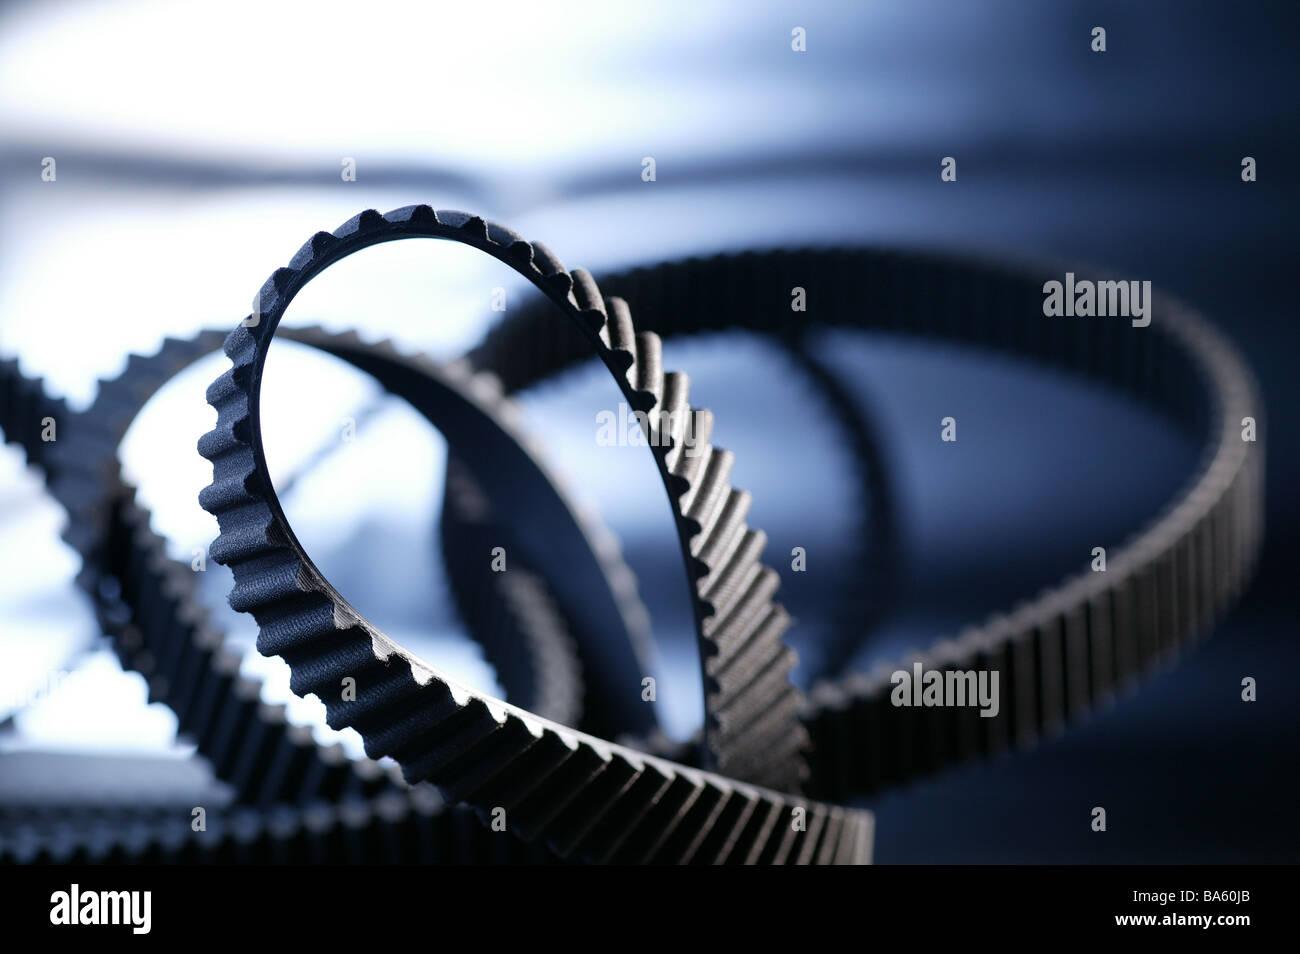 Motor Part Stockfotos & Motor Part Bilder - Alamy